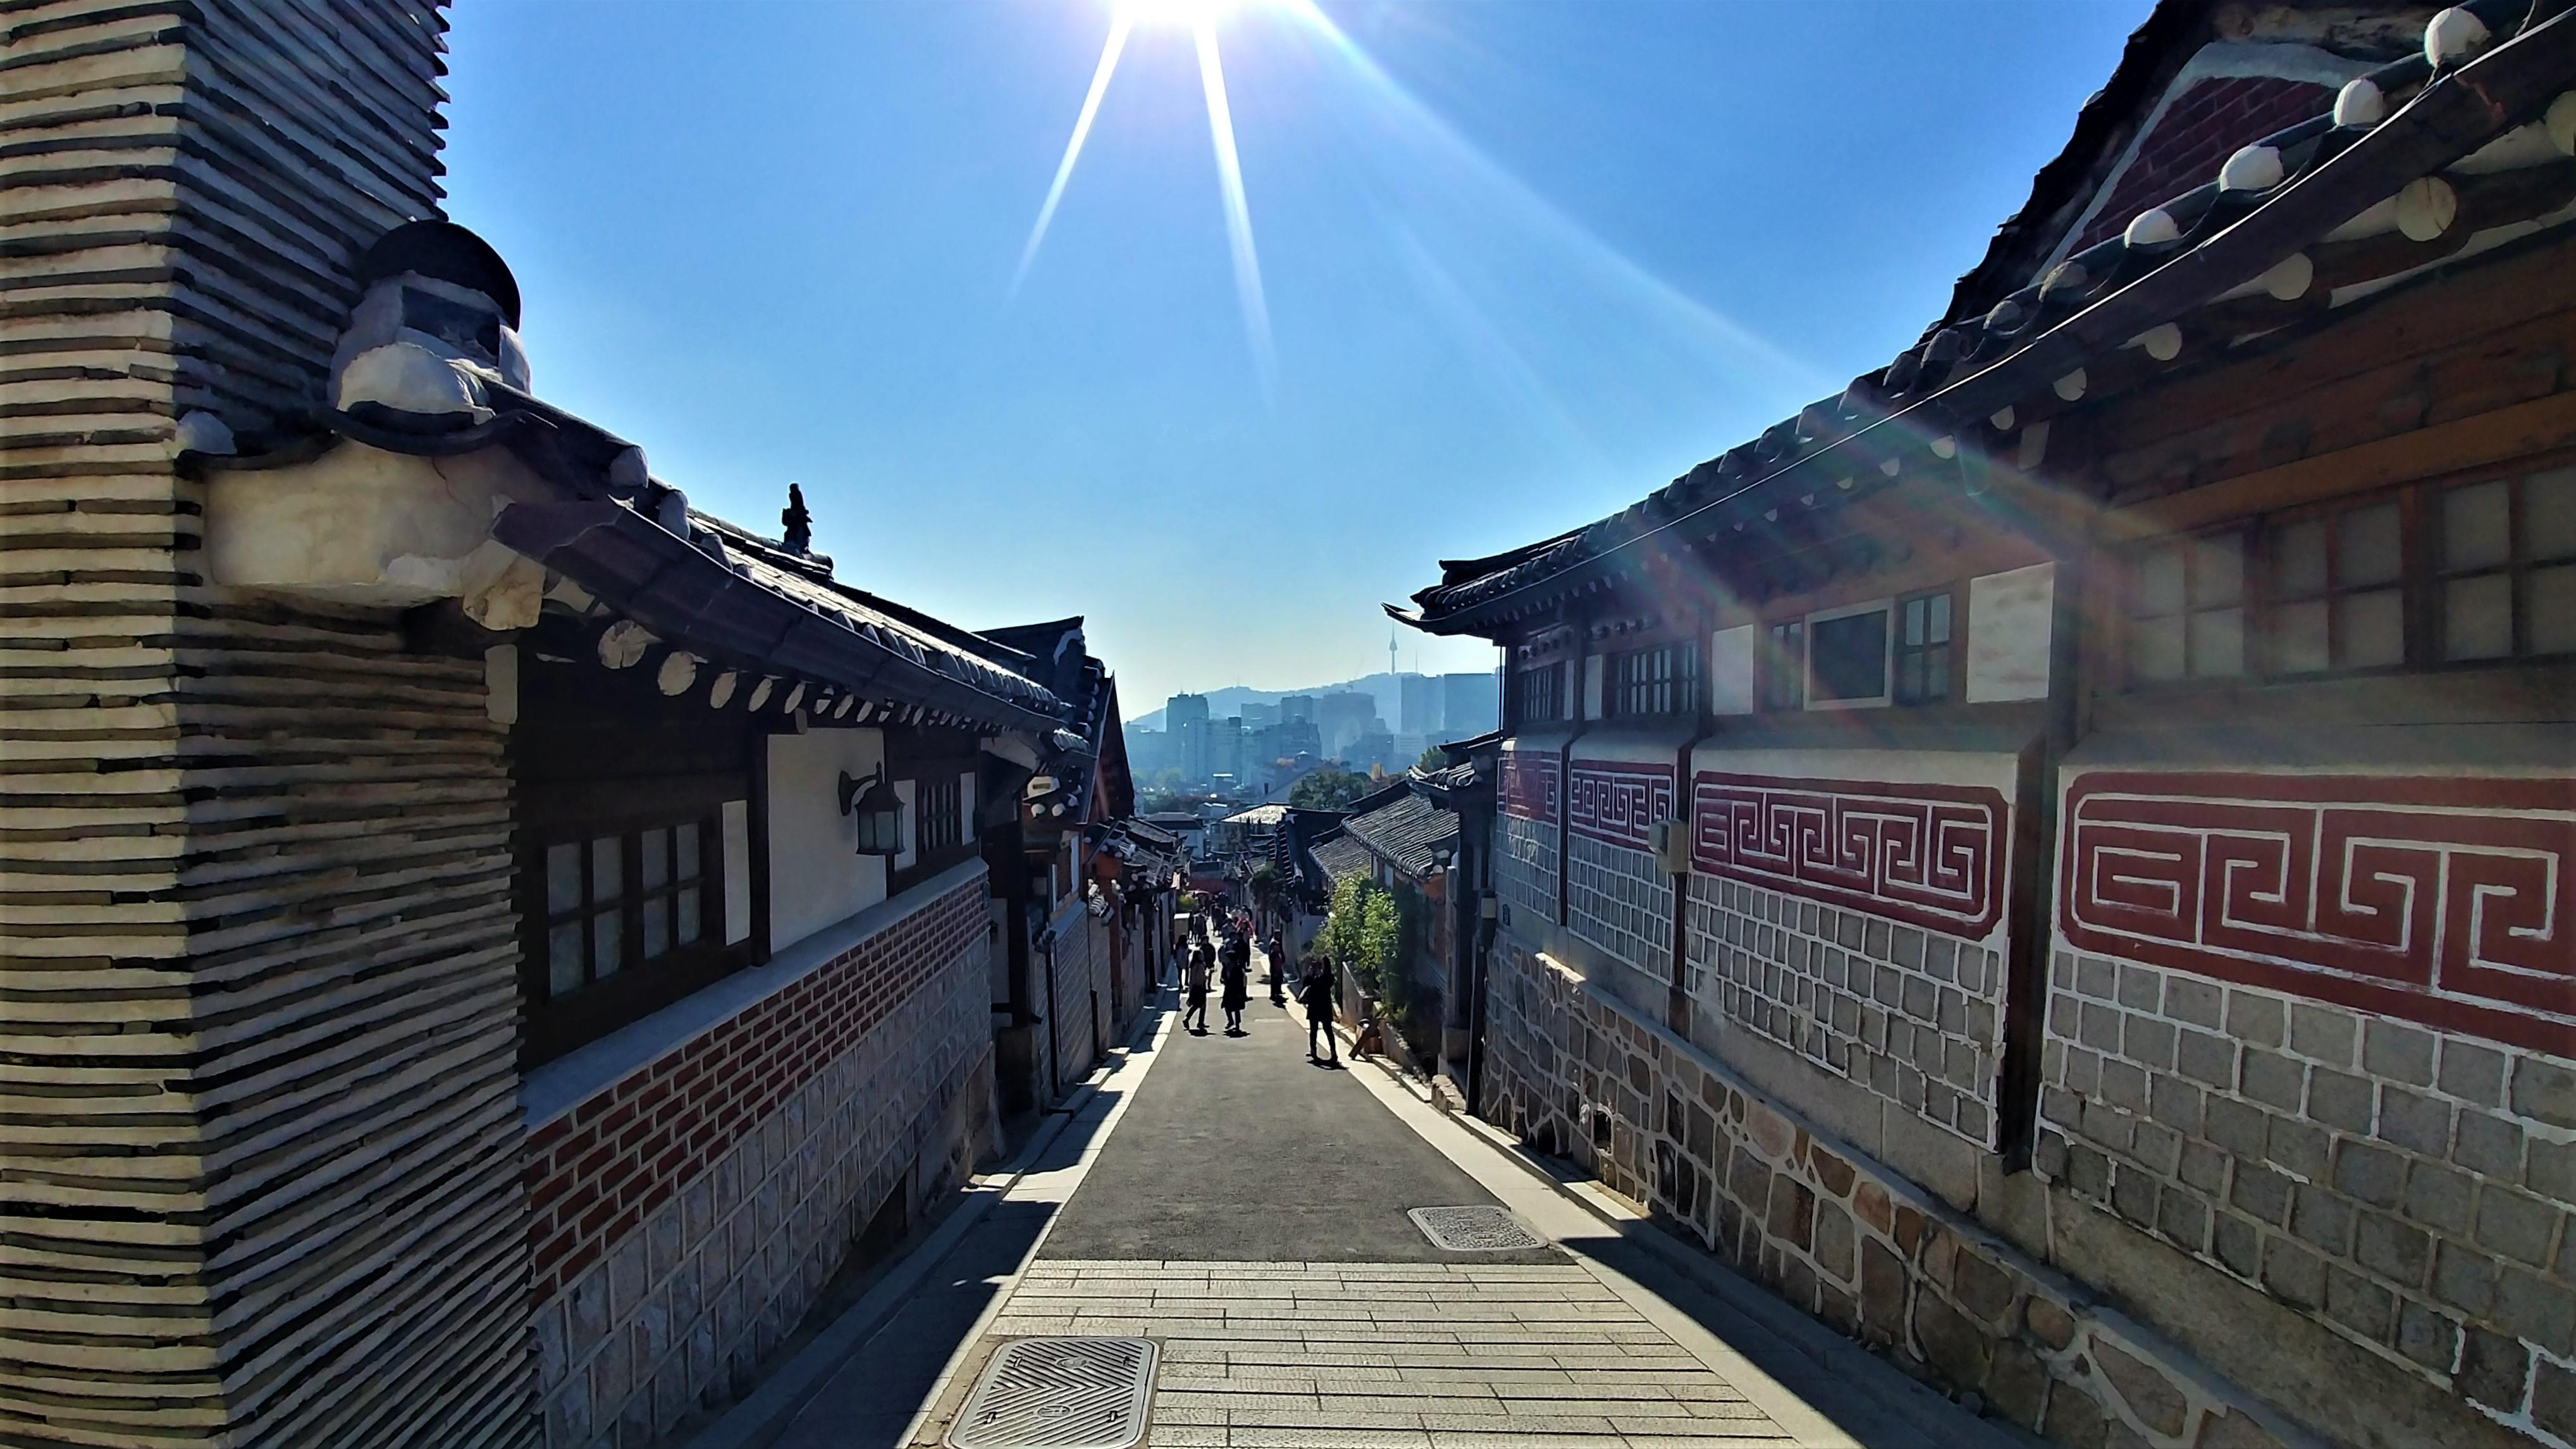 seoul hanok bukchon blog voyage arpenter le chemin